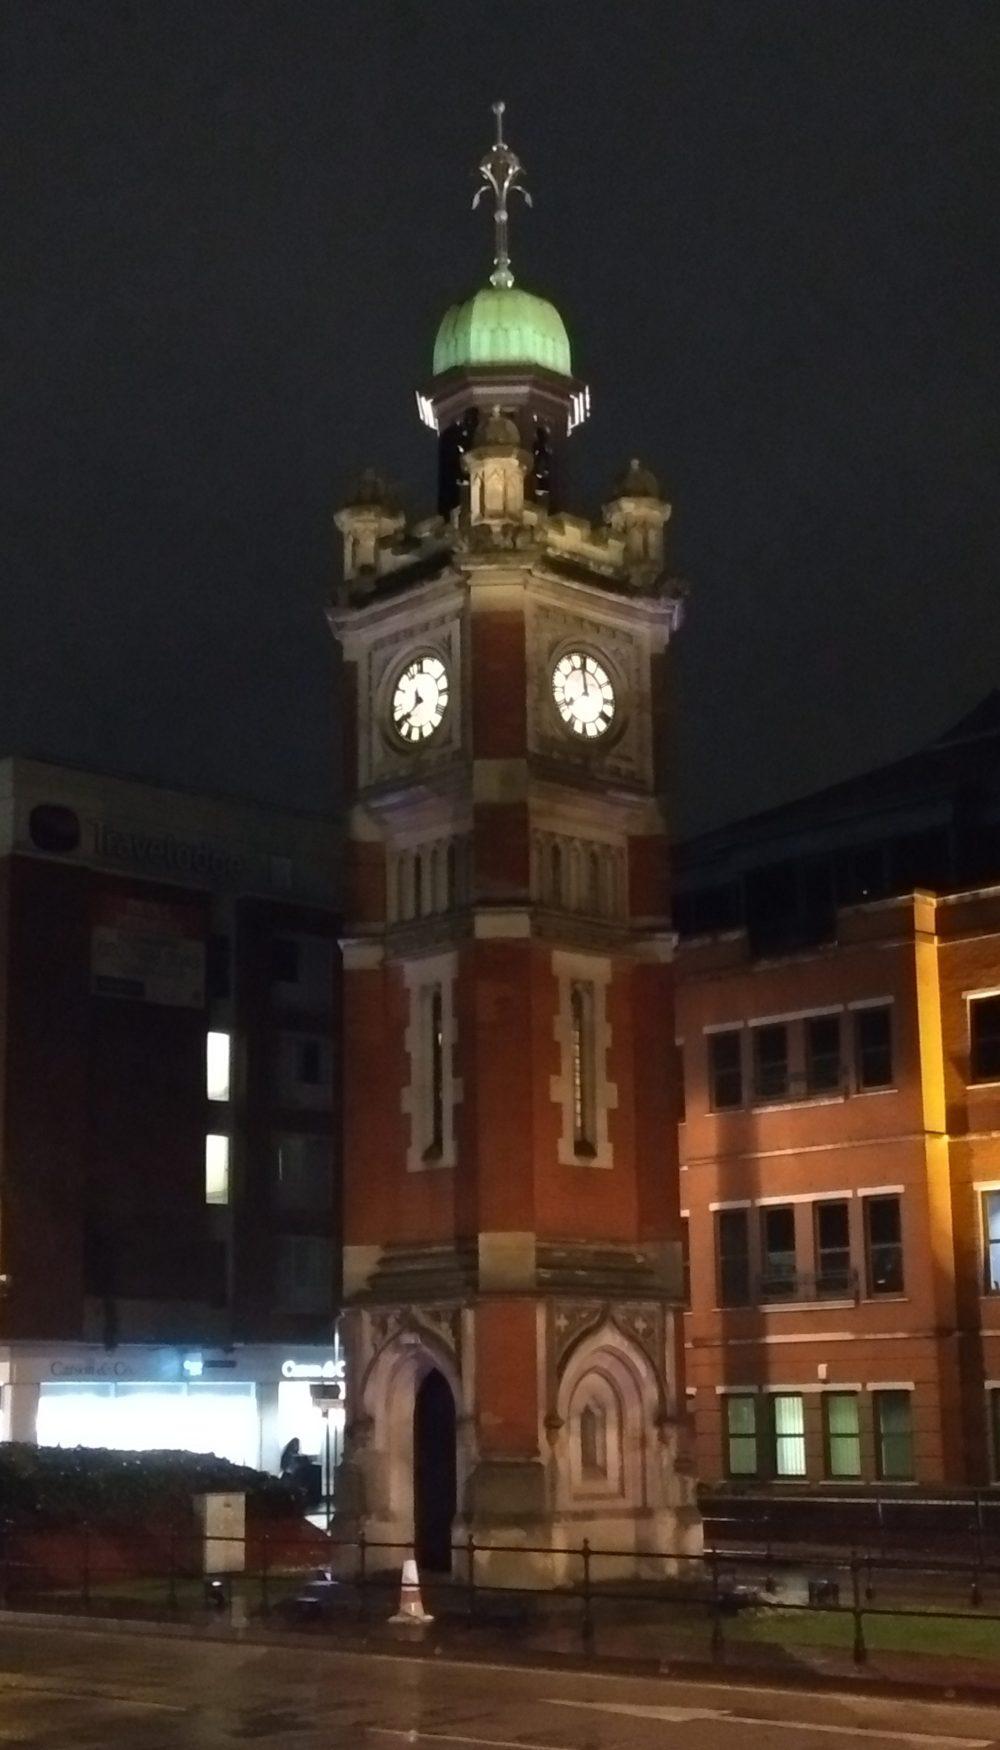 Maidenhead Clock Tower at night